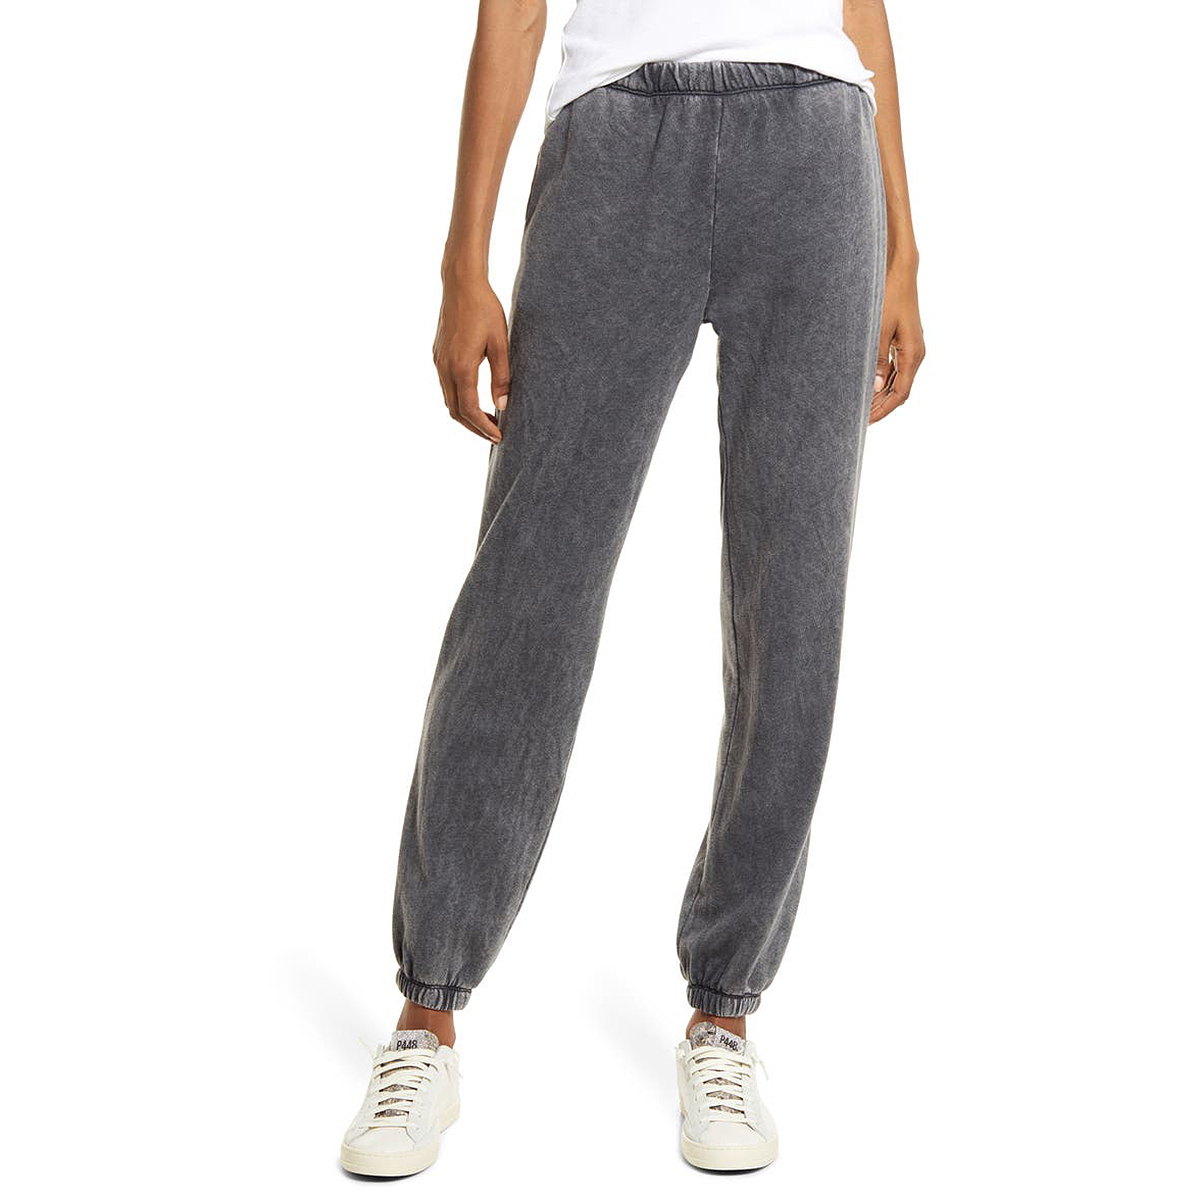 nordstrom-anniversary-sale-zara-style-treasure-bond-sweatpants